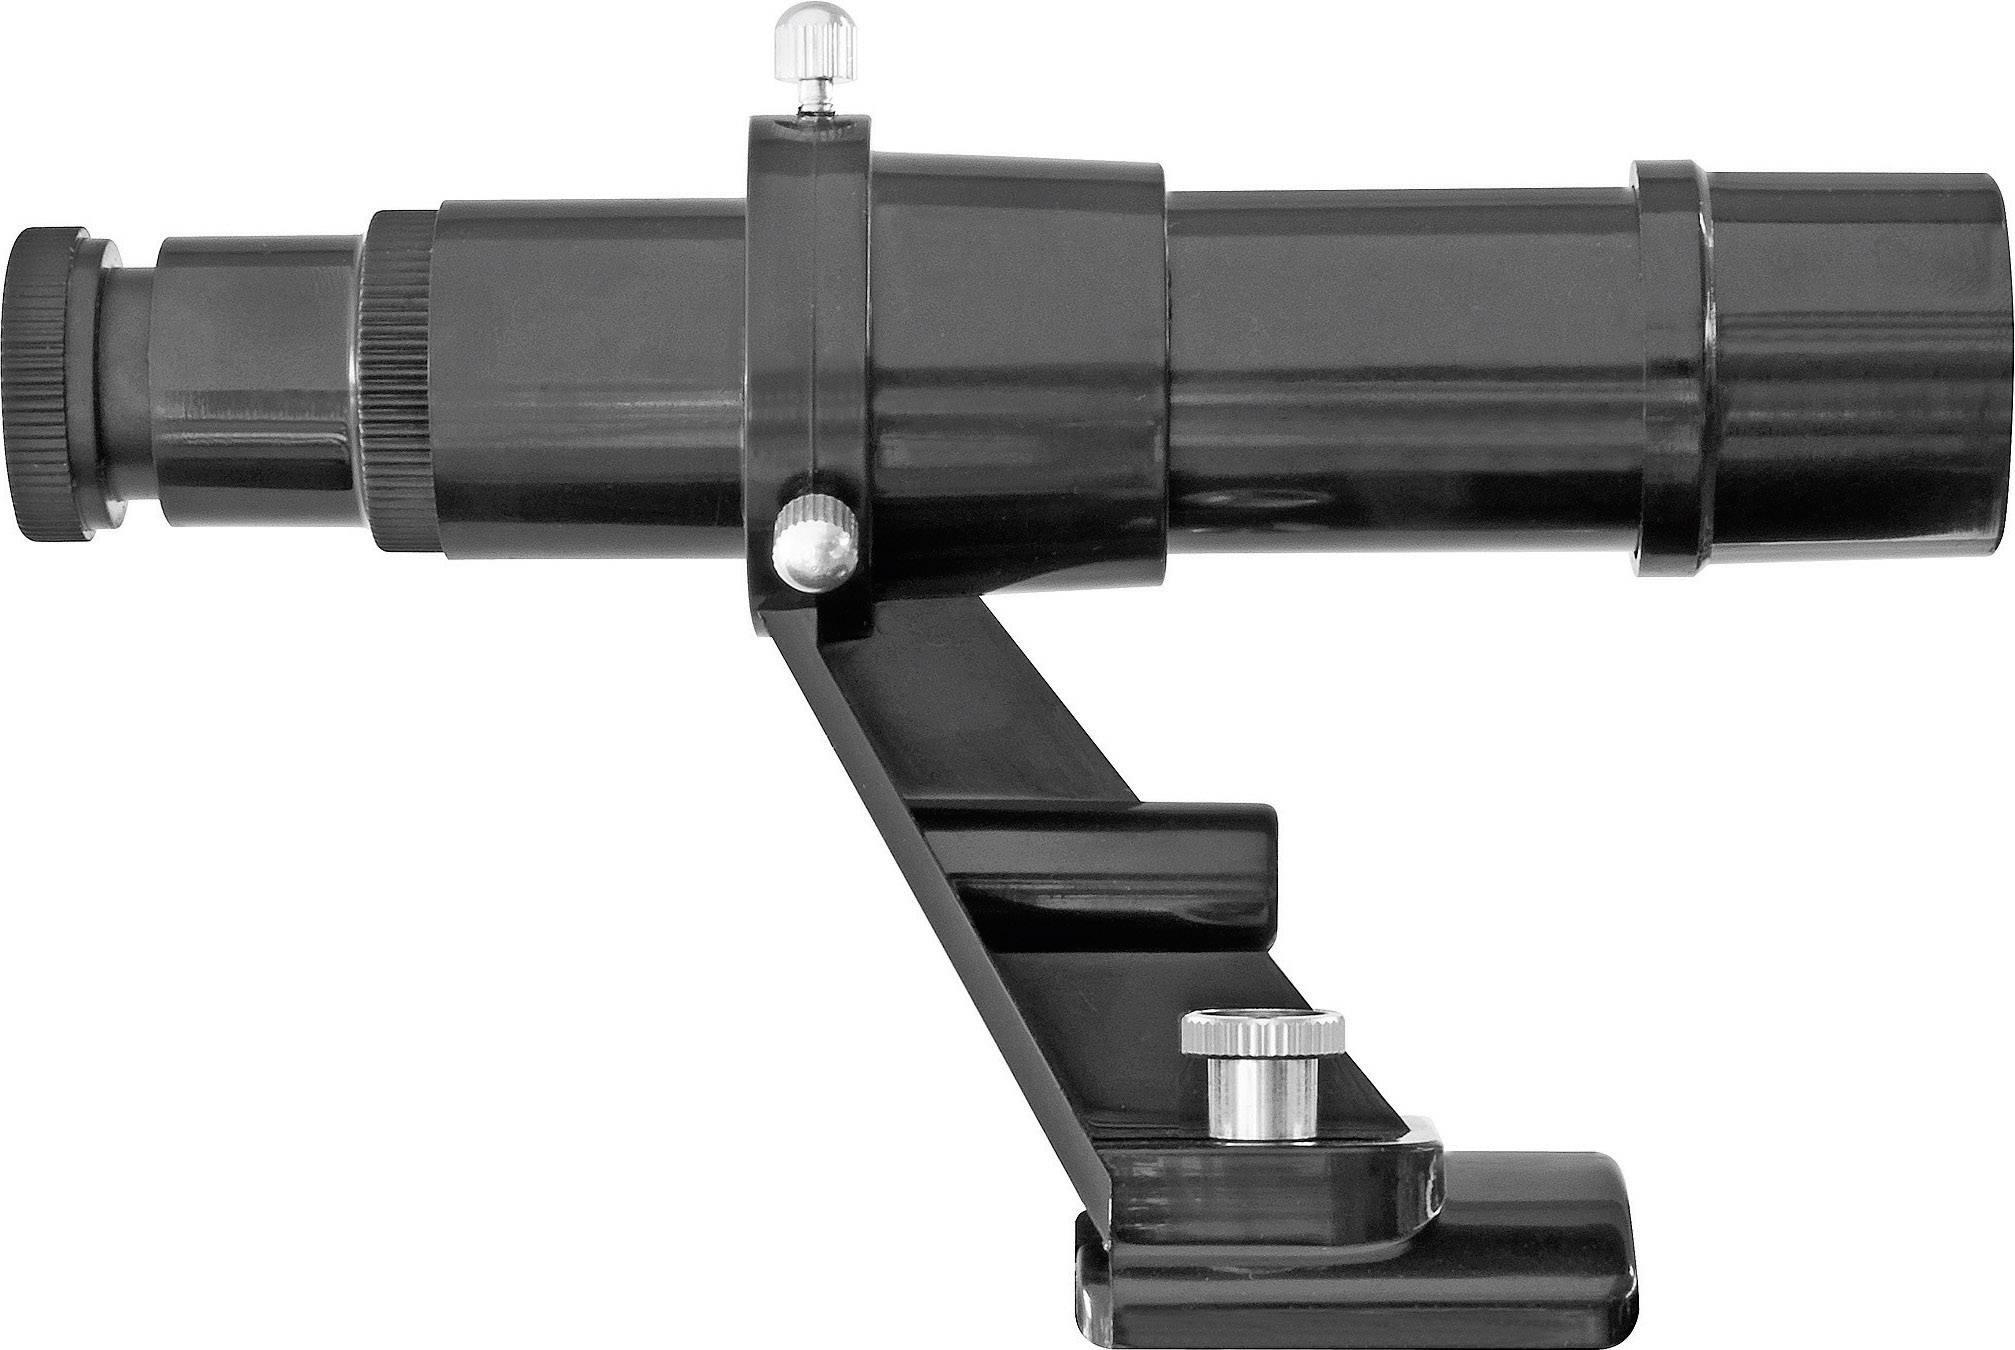 Teleskop national geographic mm okulary x